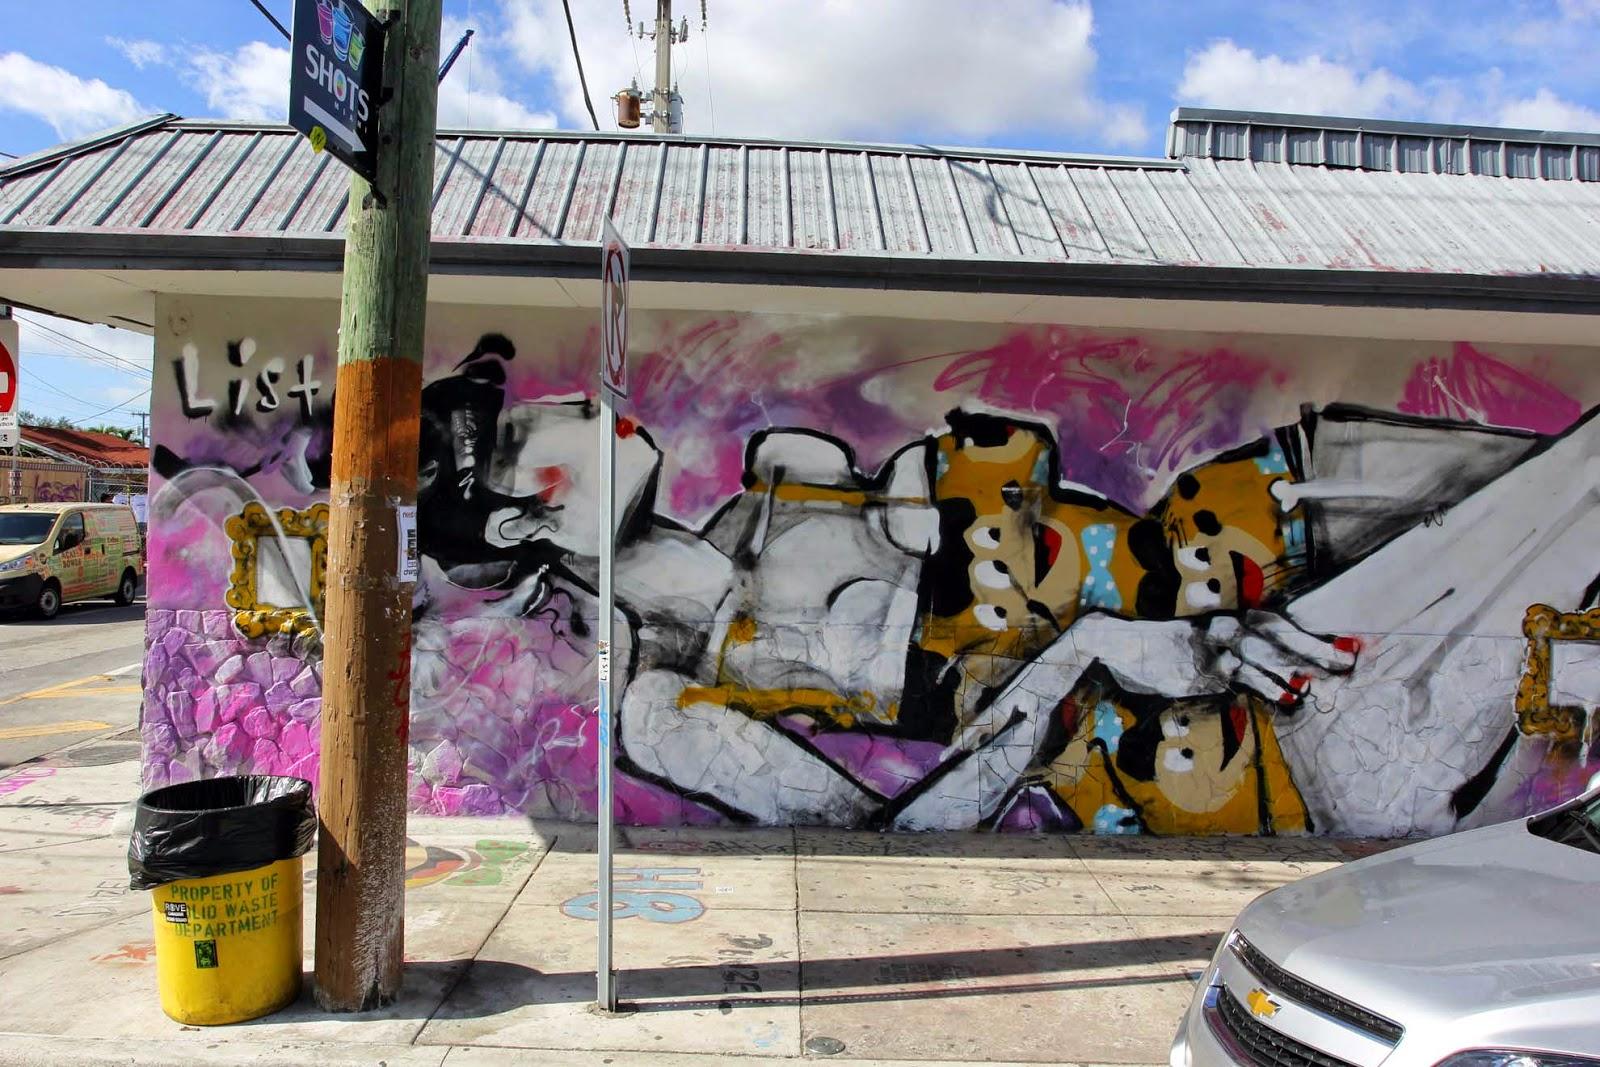 anthony-lister-new-mural-at-art-basel-2014-02